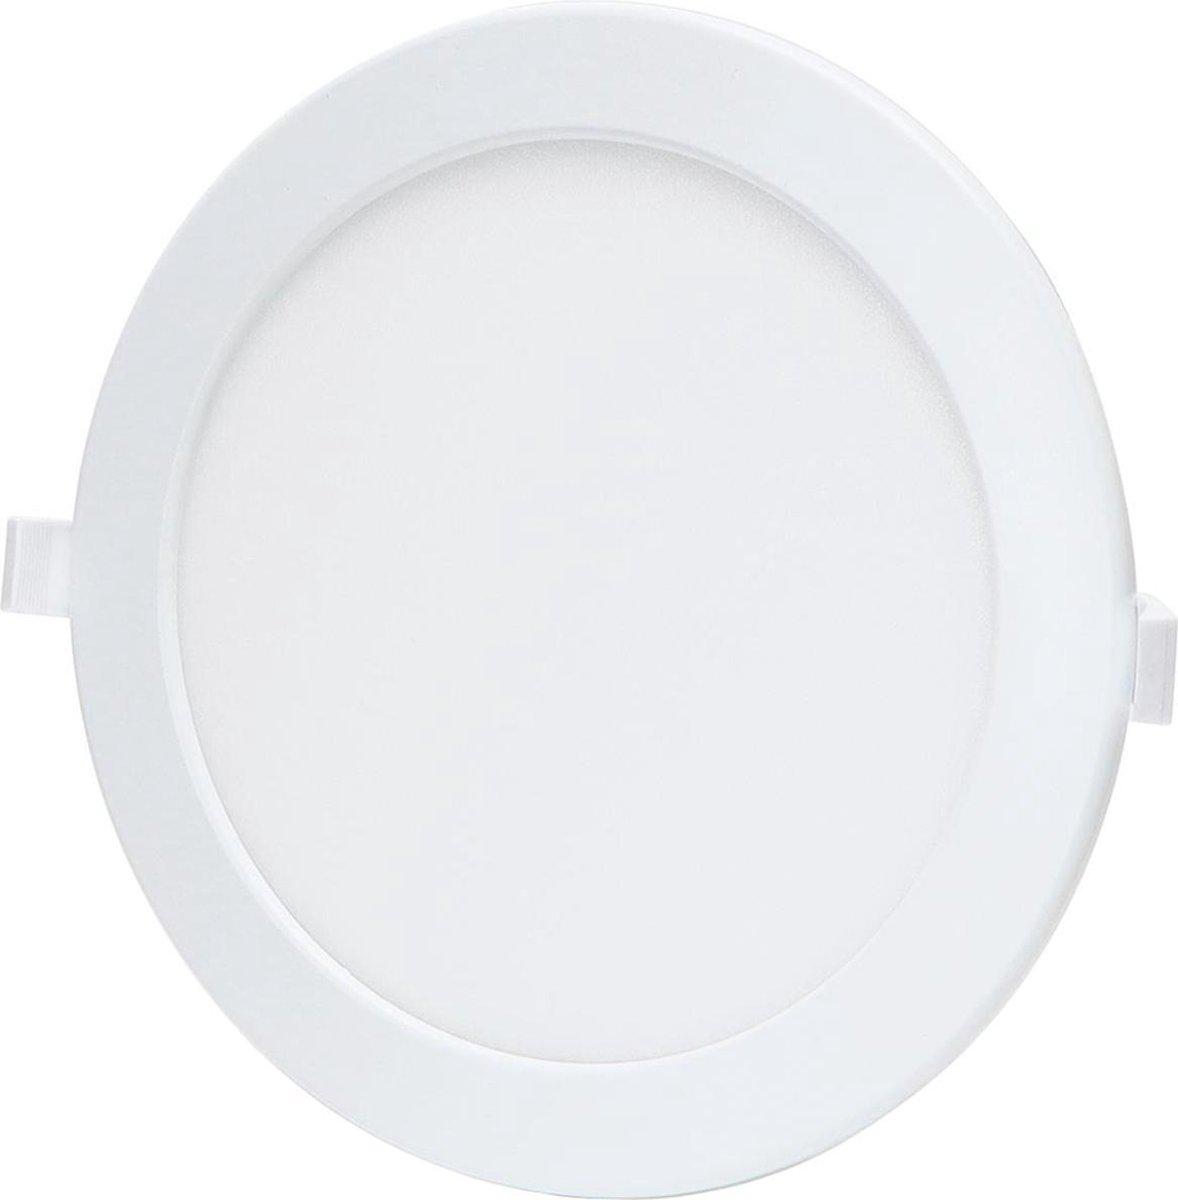 LED Downlight - Smart LED - Igory Zumba - 18W - Aanpasbare Kleur - Inbouw Rond - Mat Wit - Aluminium - Ø220mm